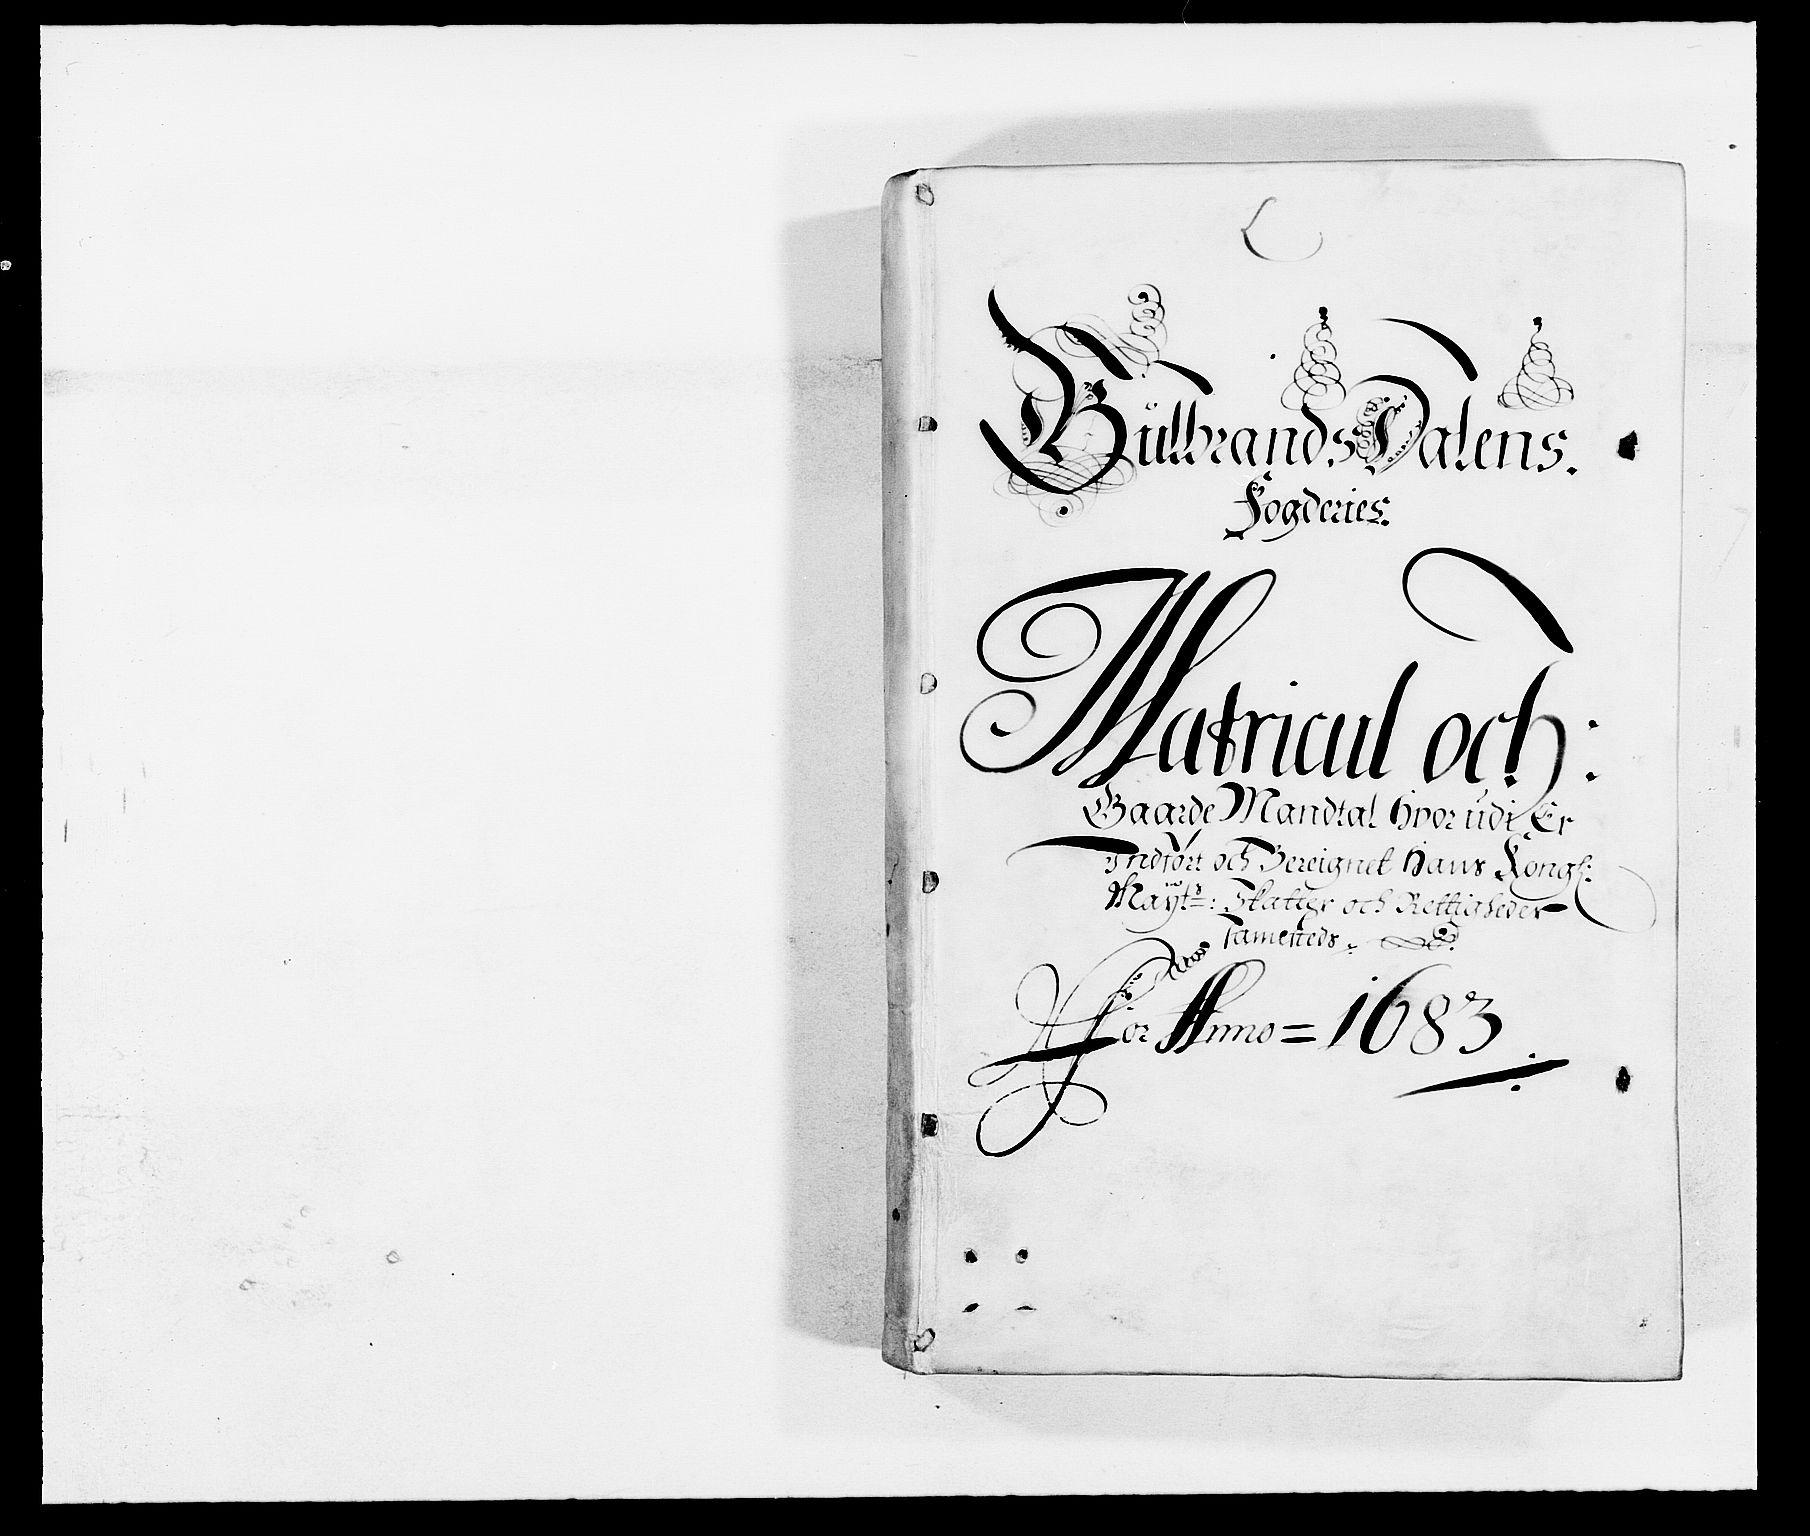 RA, Rentekammeret inntil 1814, Reviderte regnskaper, Fogderegnskap, R17/L1158: Fogderegnskap Gudbrandsdal, 1682-1689, s. 60